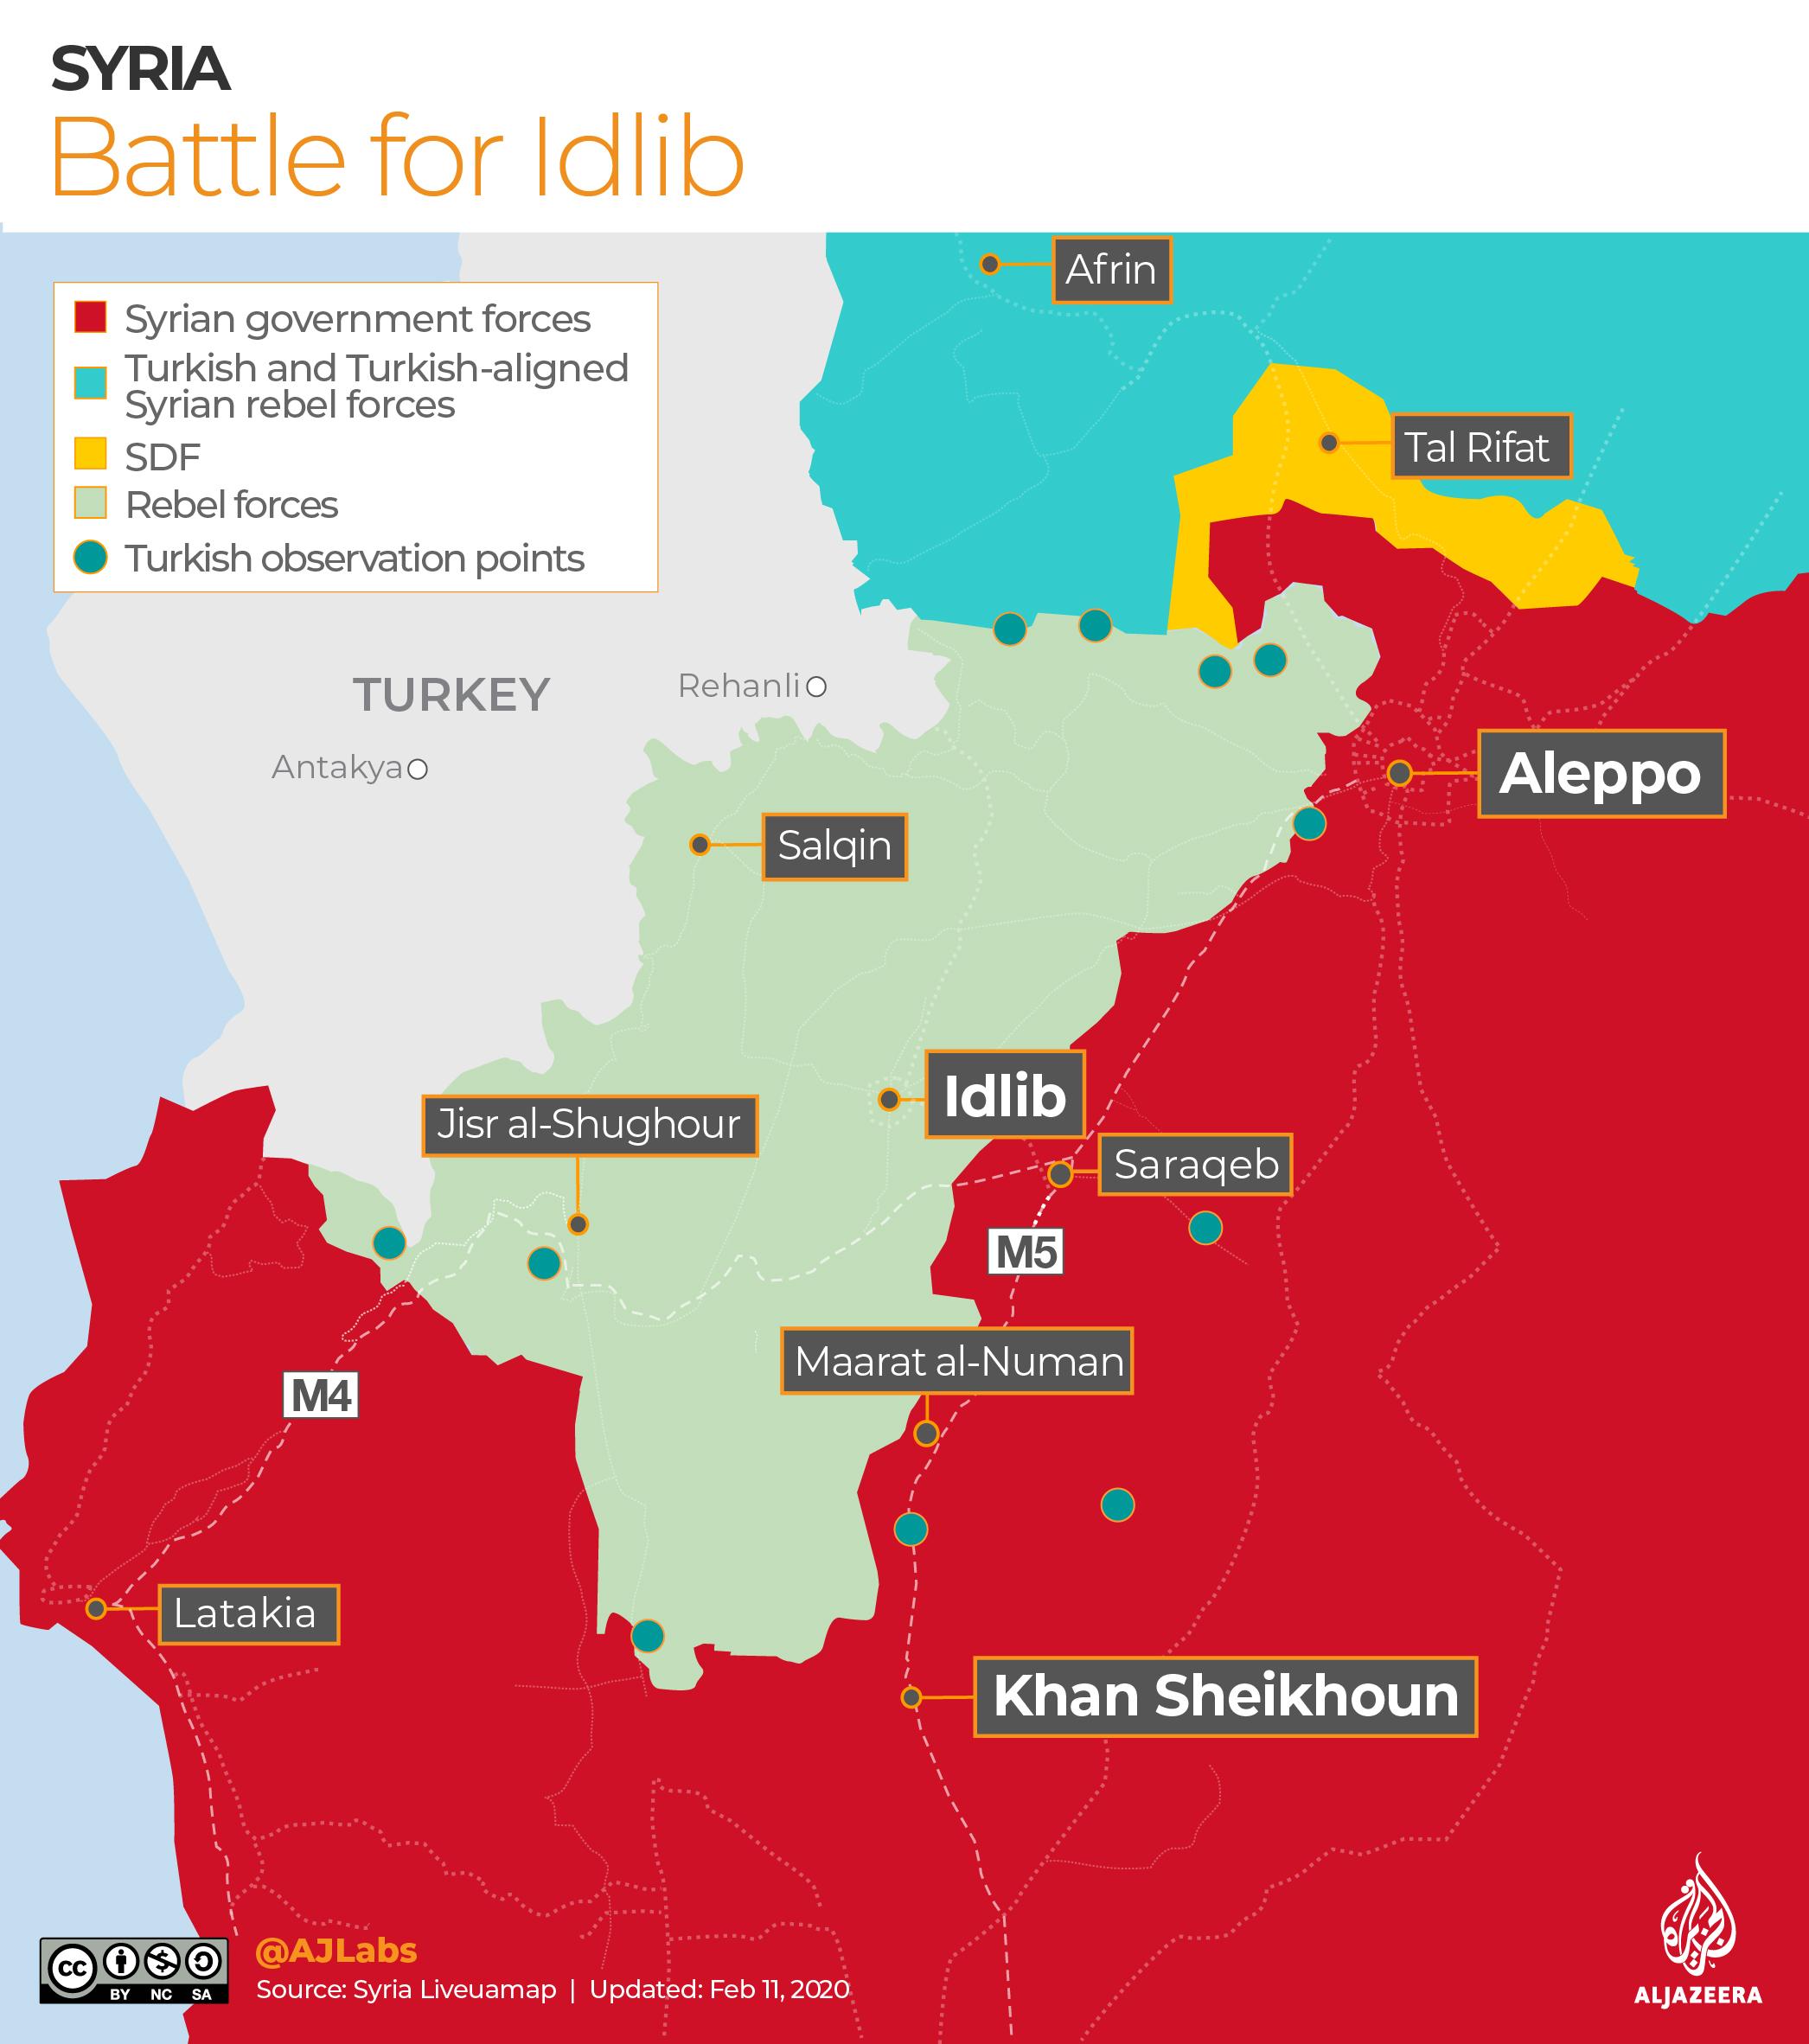 INTERACTIVE: Syria control map - Battle for Idlib - Feb 2, 2020